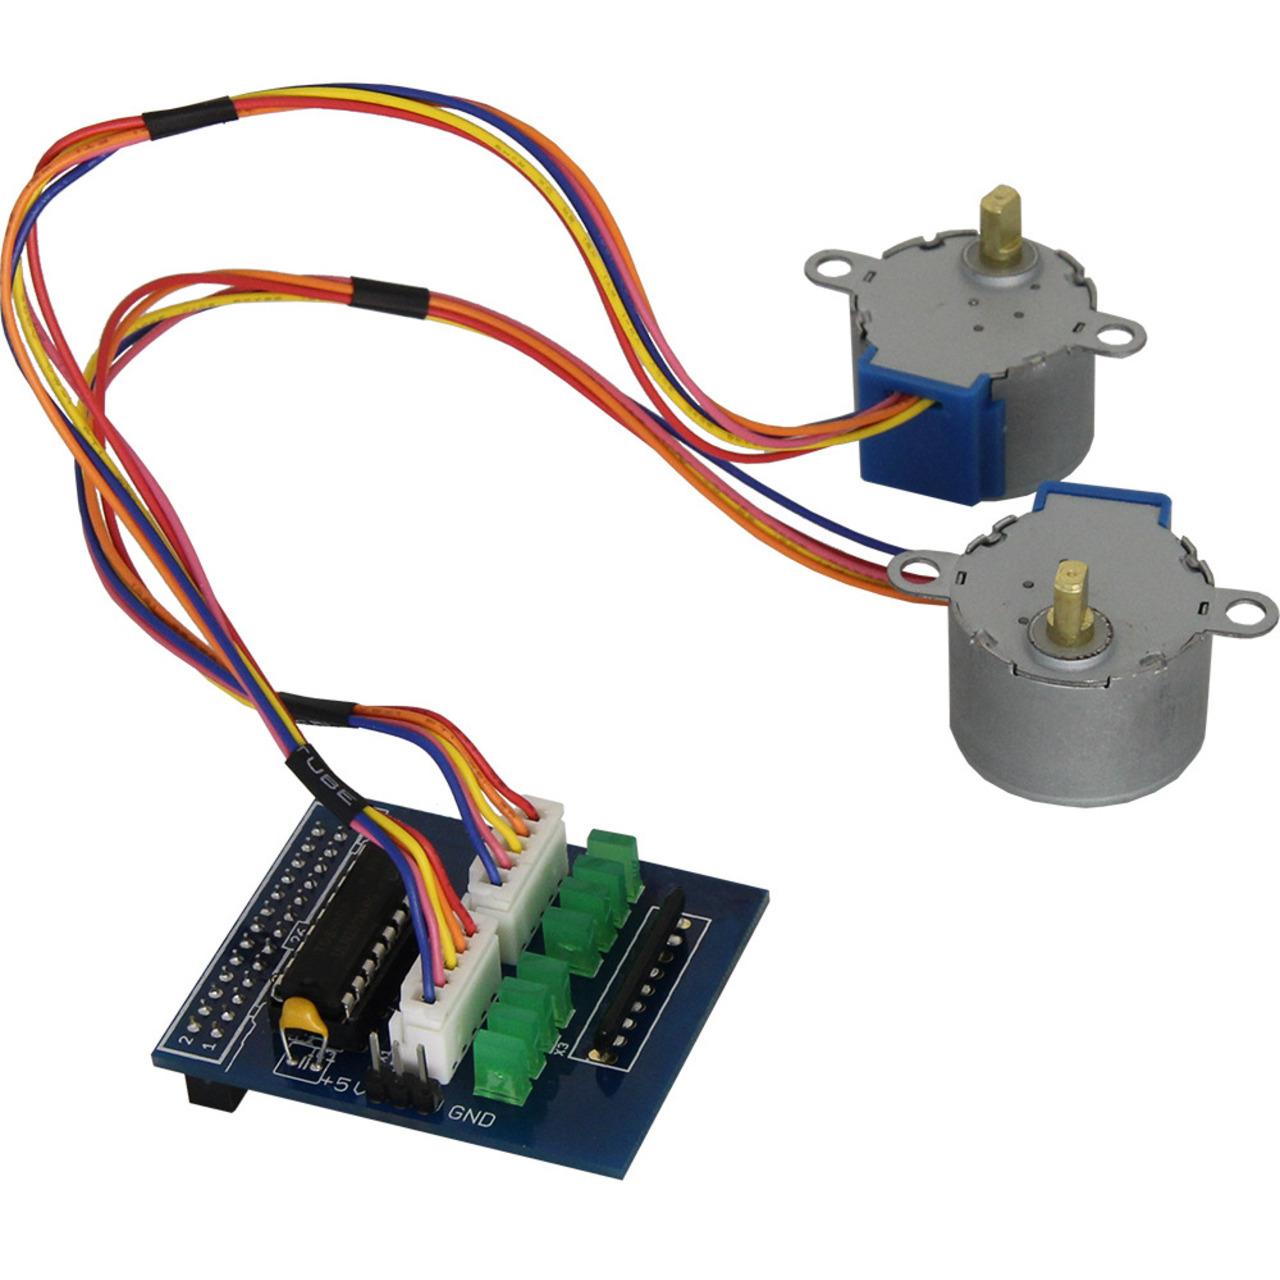 Image of Amerry Motorsteuerung für Raspberry Pi inkl. 2 Schrittmotoren